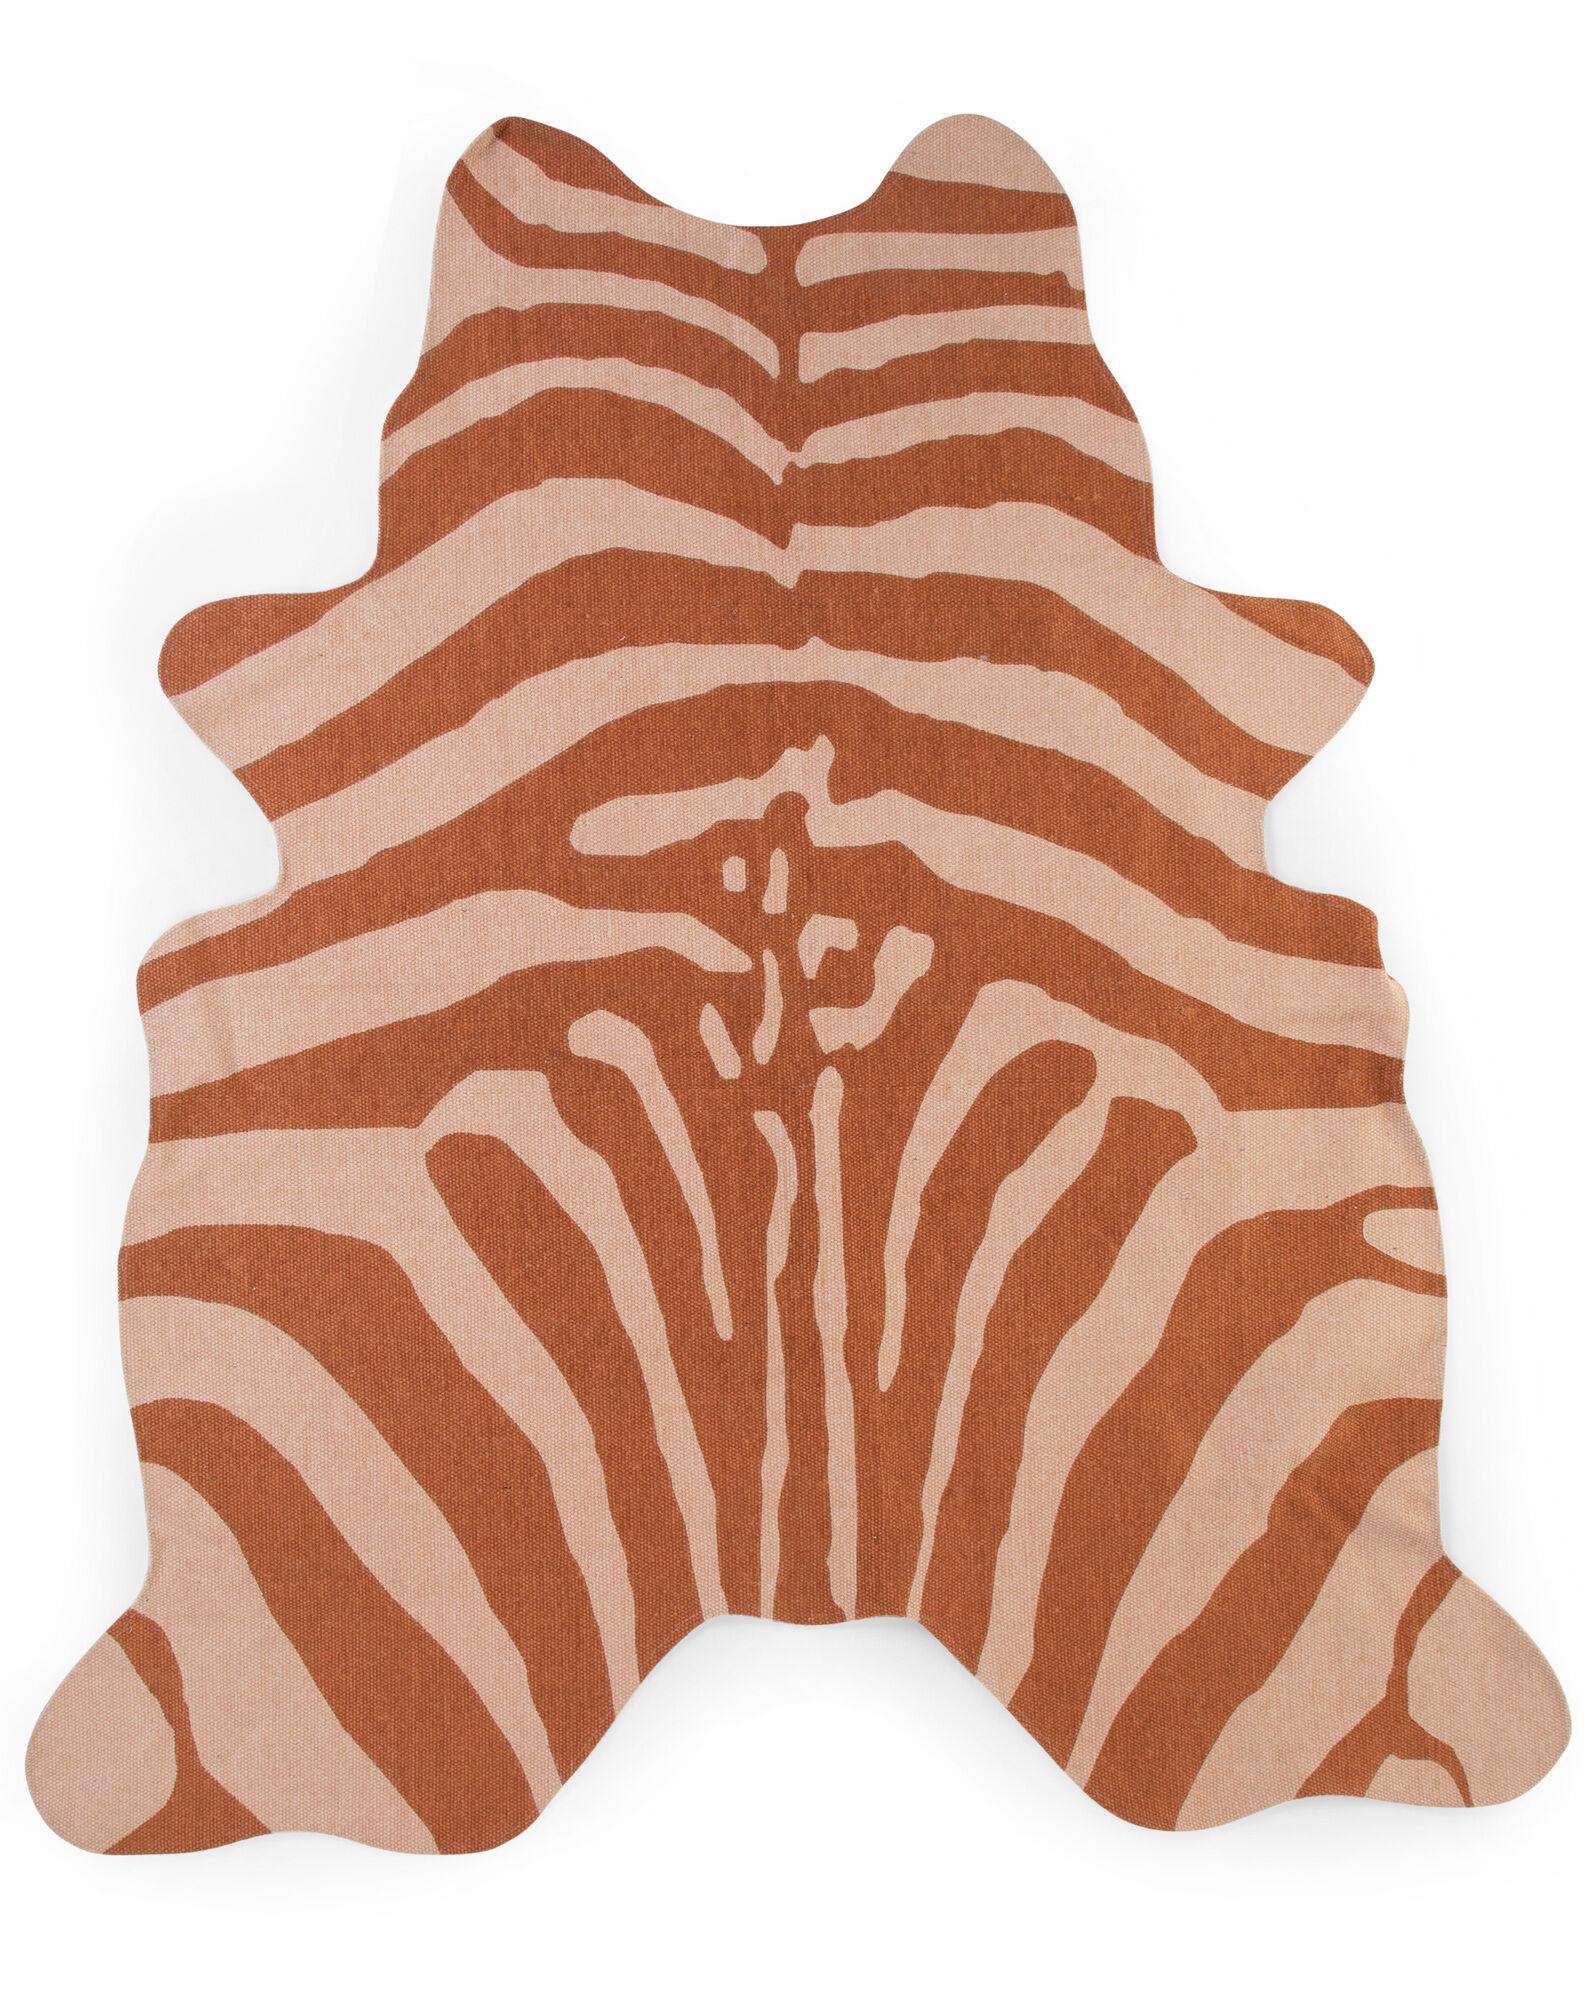 CHILDHOME Χαλί Childhome Zebra Carpet Nude 145*160cm